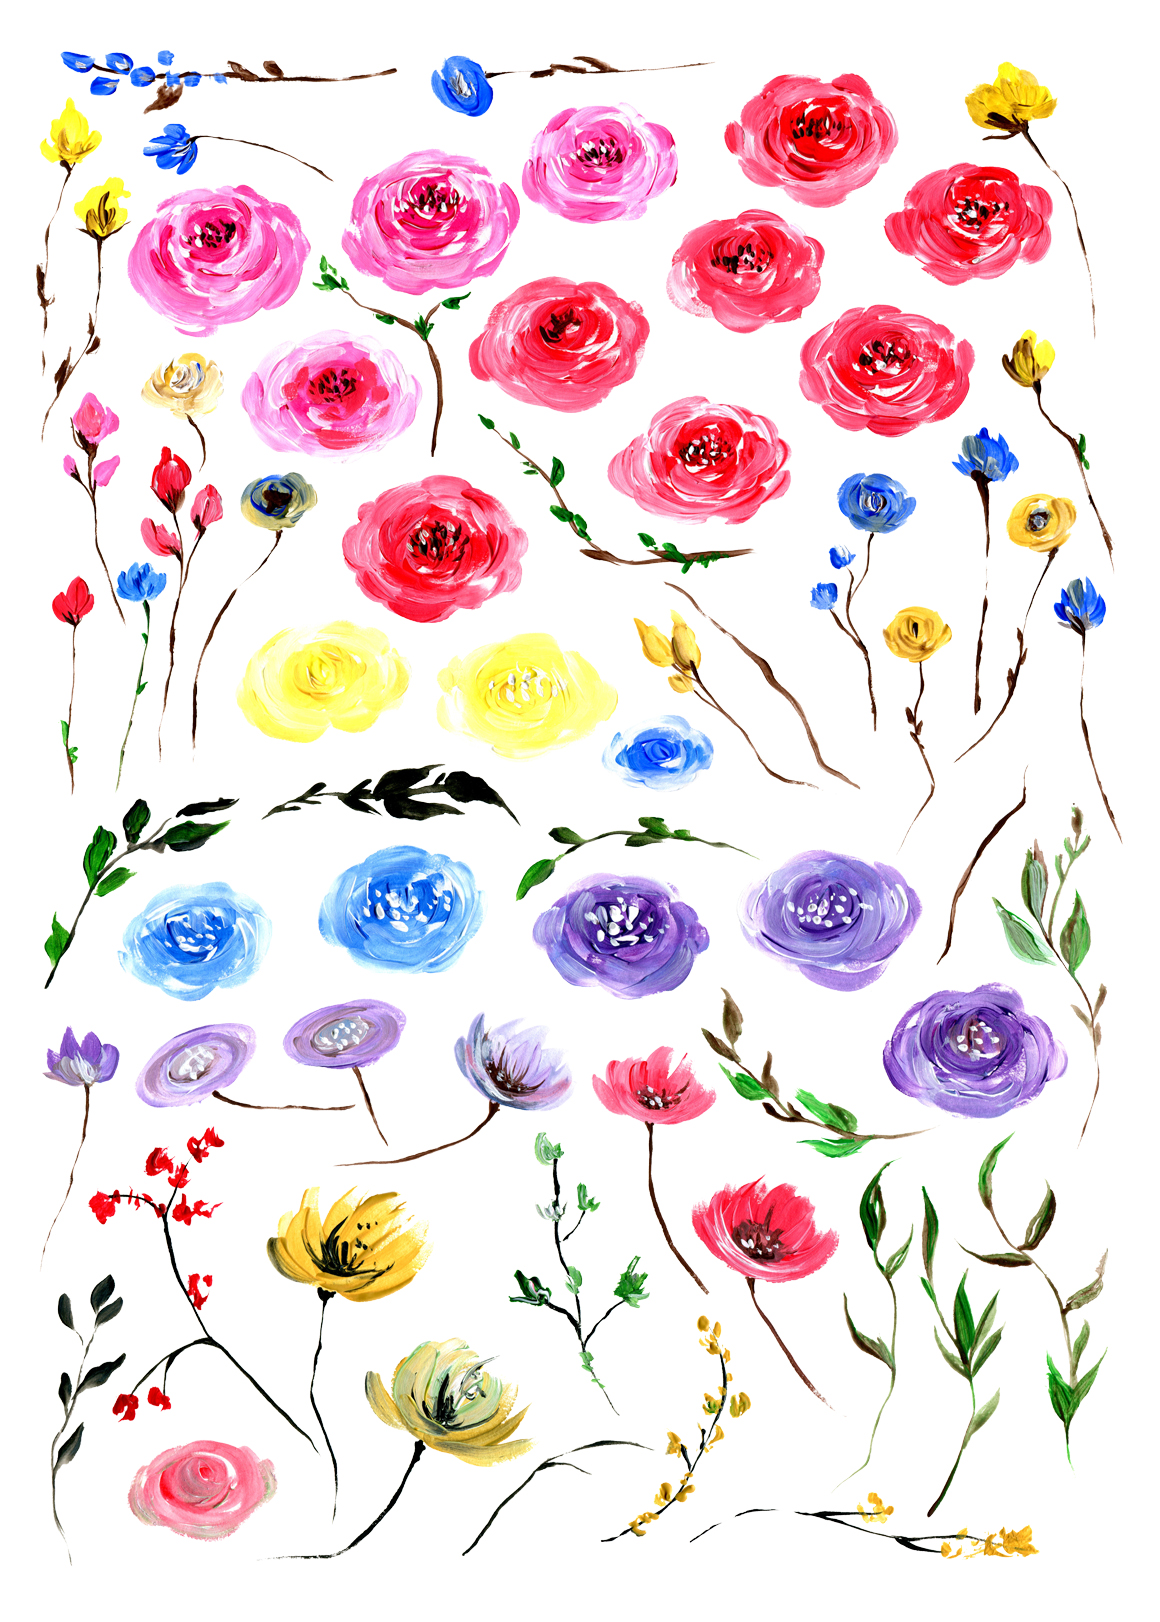 Acrylic floral big set 65 elements example image 2